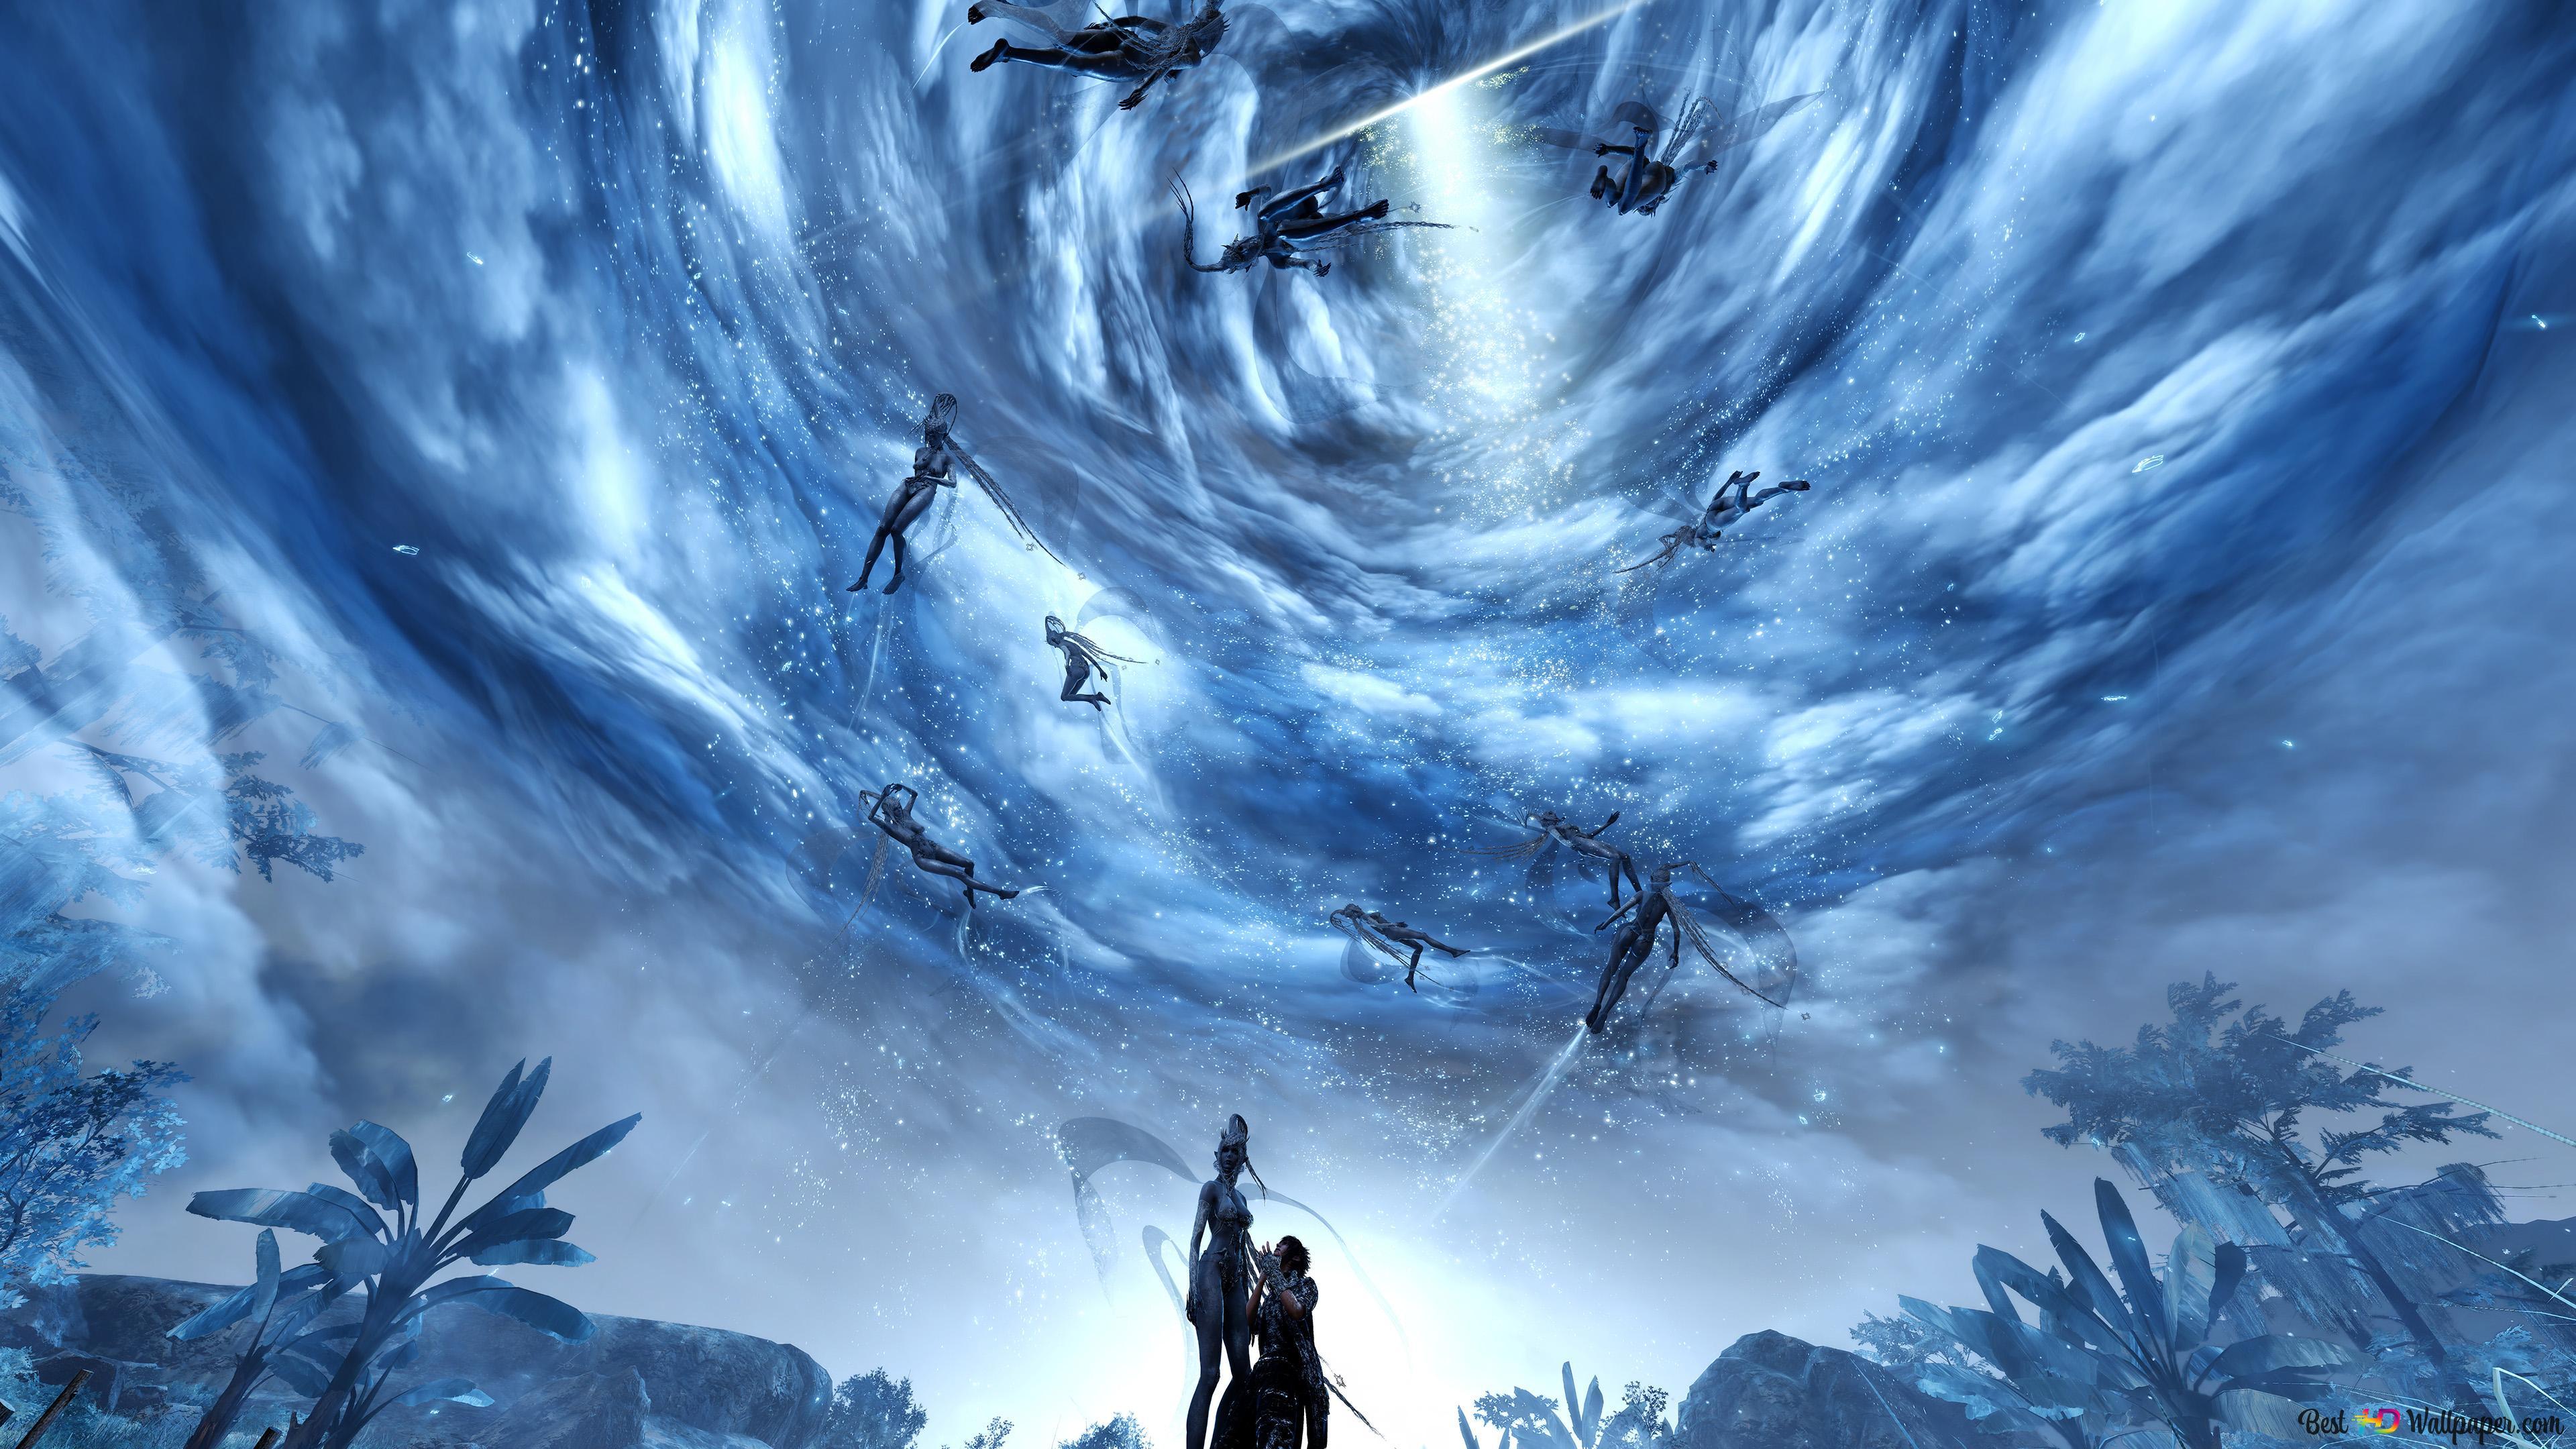 Final Fantasy Xv Strange Sky Hd Wallpaper Download